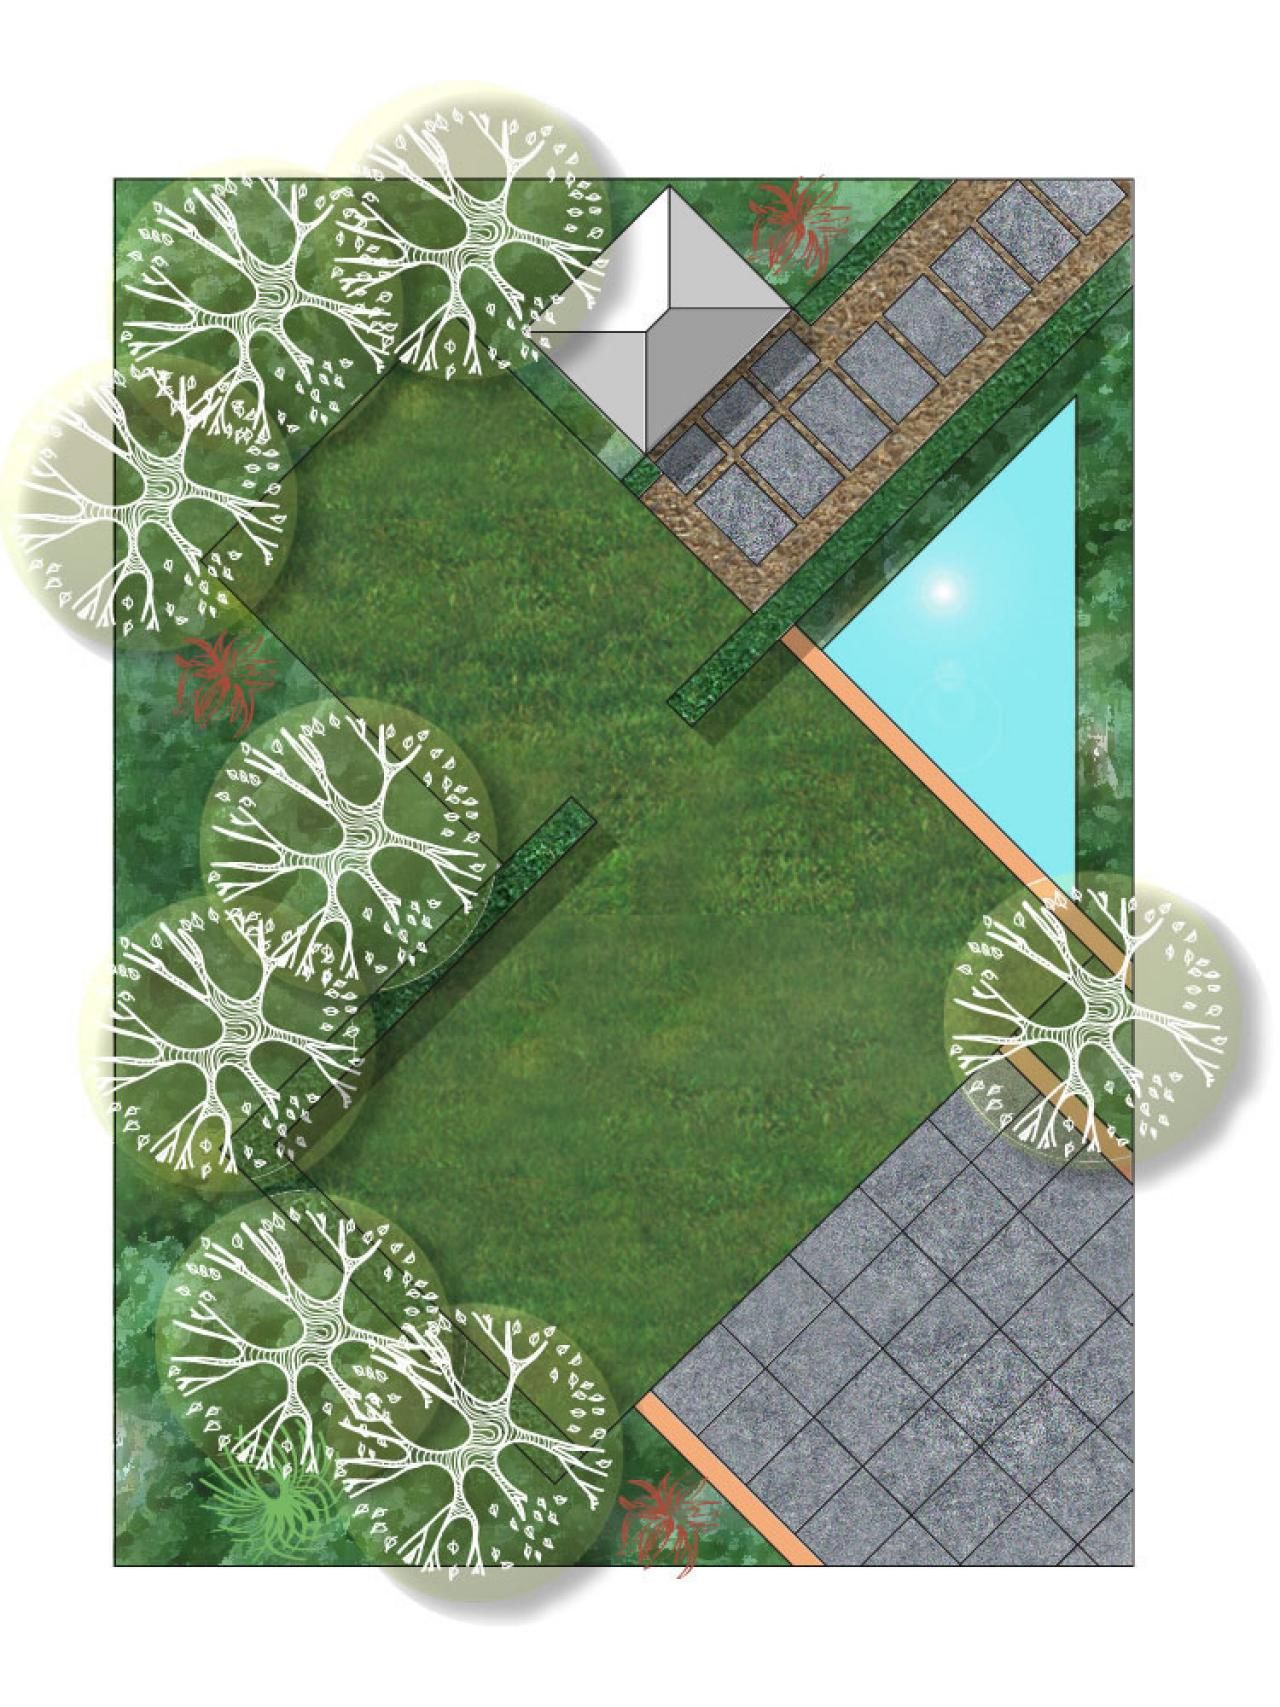 Garden Design Rectangular Plot diagonal garden layout | inspiration - garden plans - plans pour